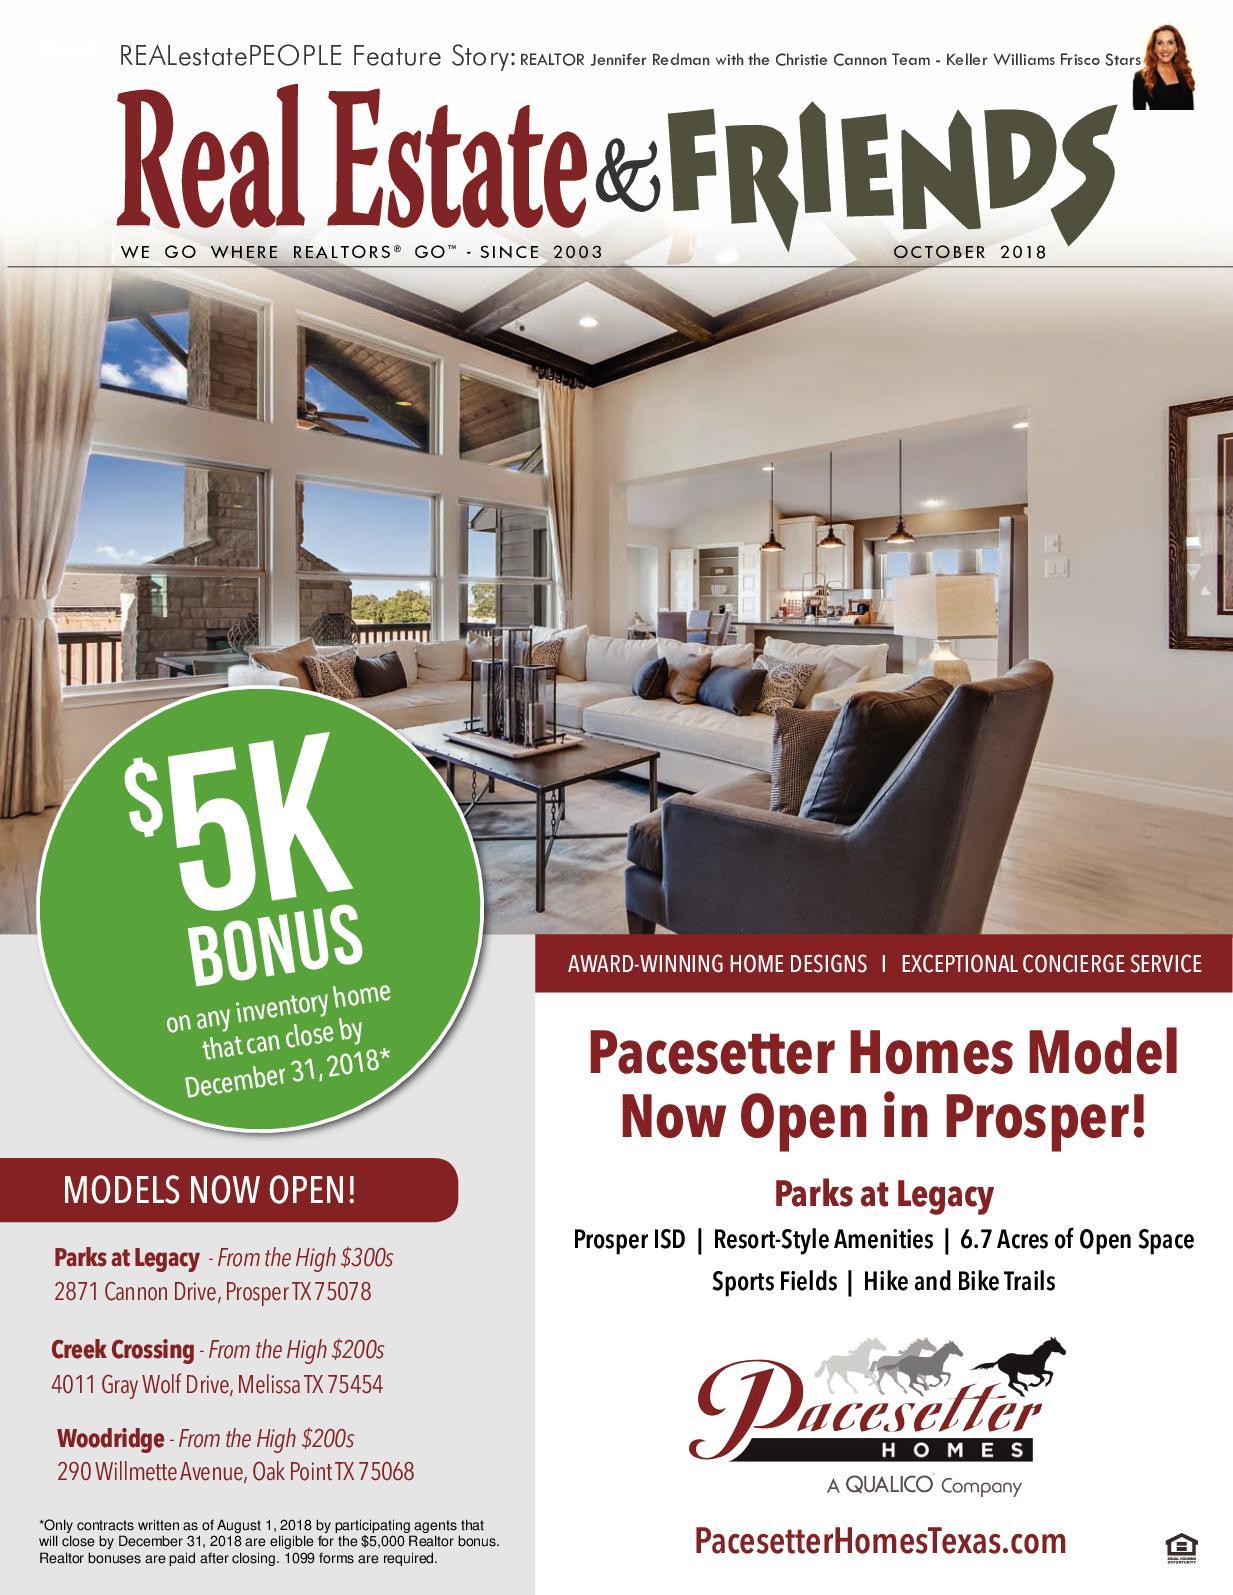 Realtor And Interior Designer Debbie Evans Realtor Interior Design Consultant Remax West Real Estate And Friends Magazine, Oct 2018